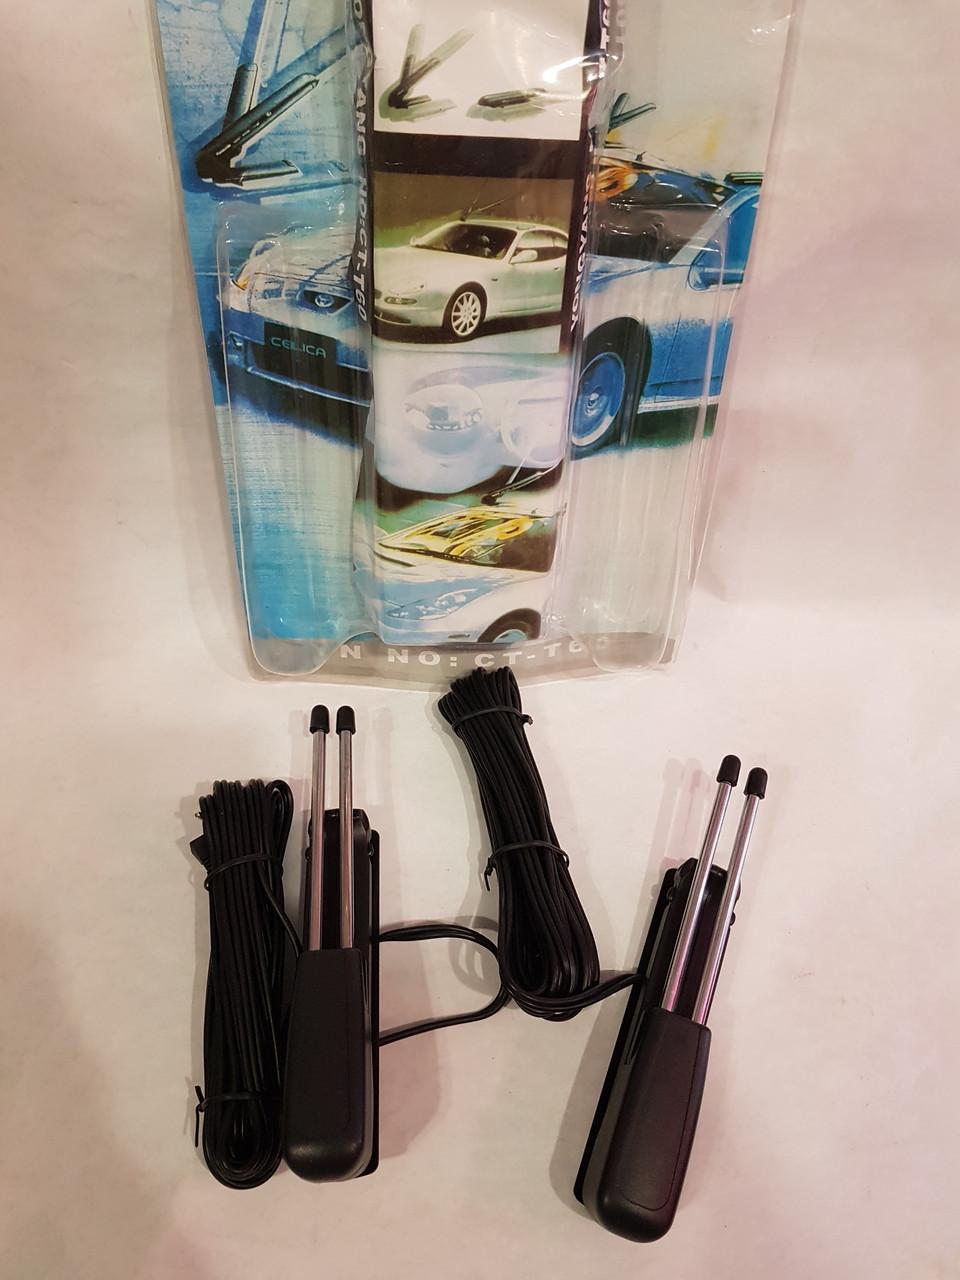 Автомобильная антенна  YONGYANG CT-T60, автомобильная ТВ антенна